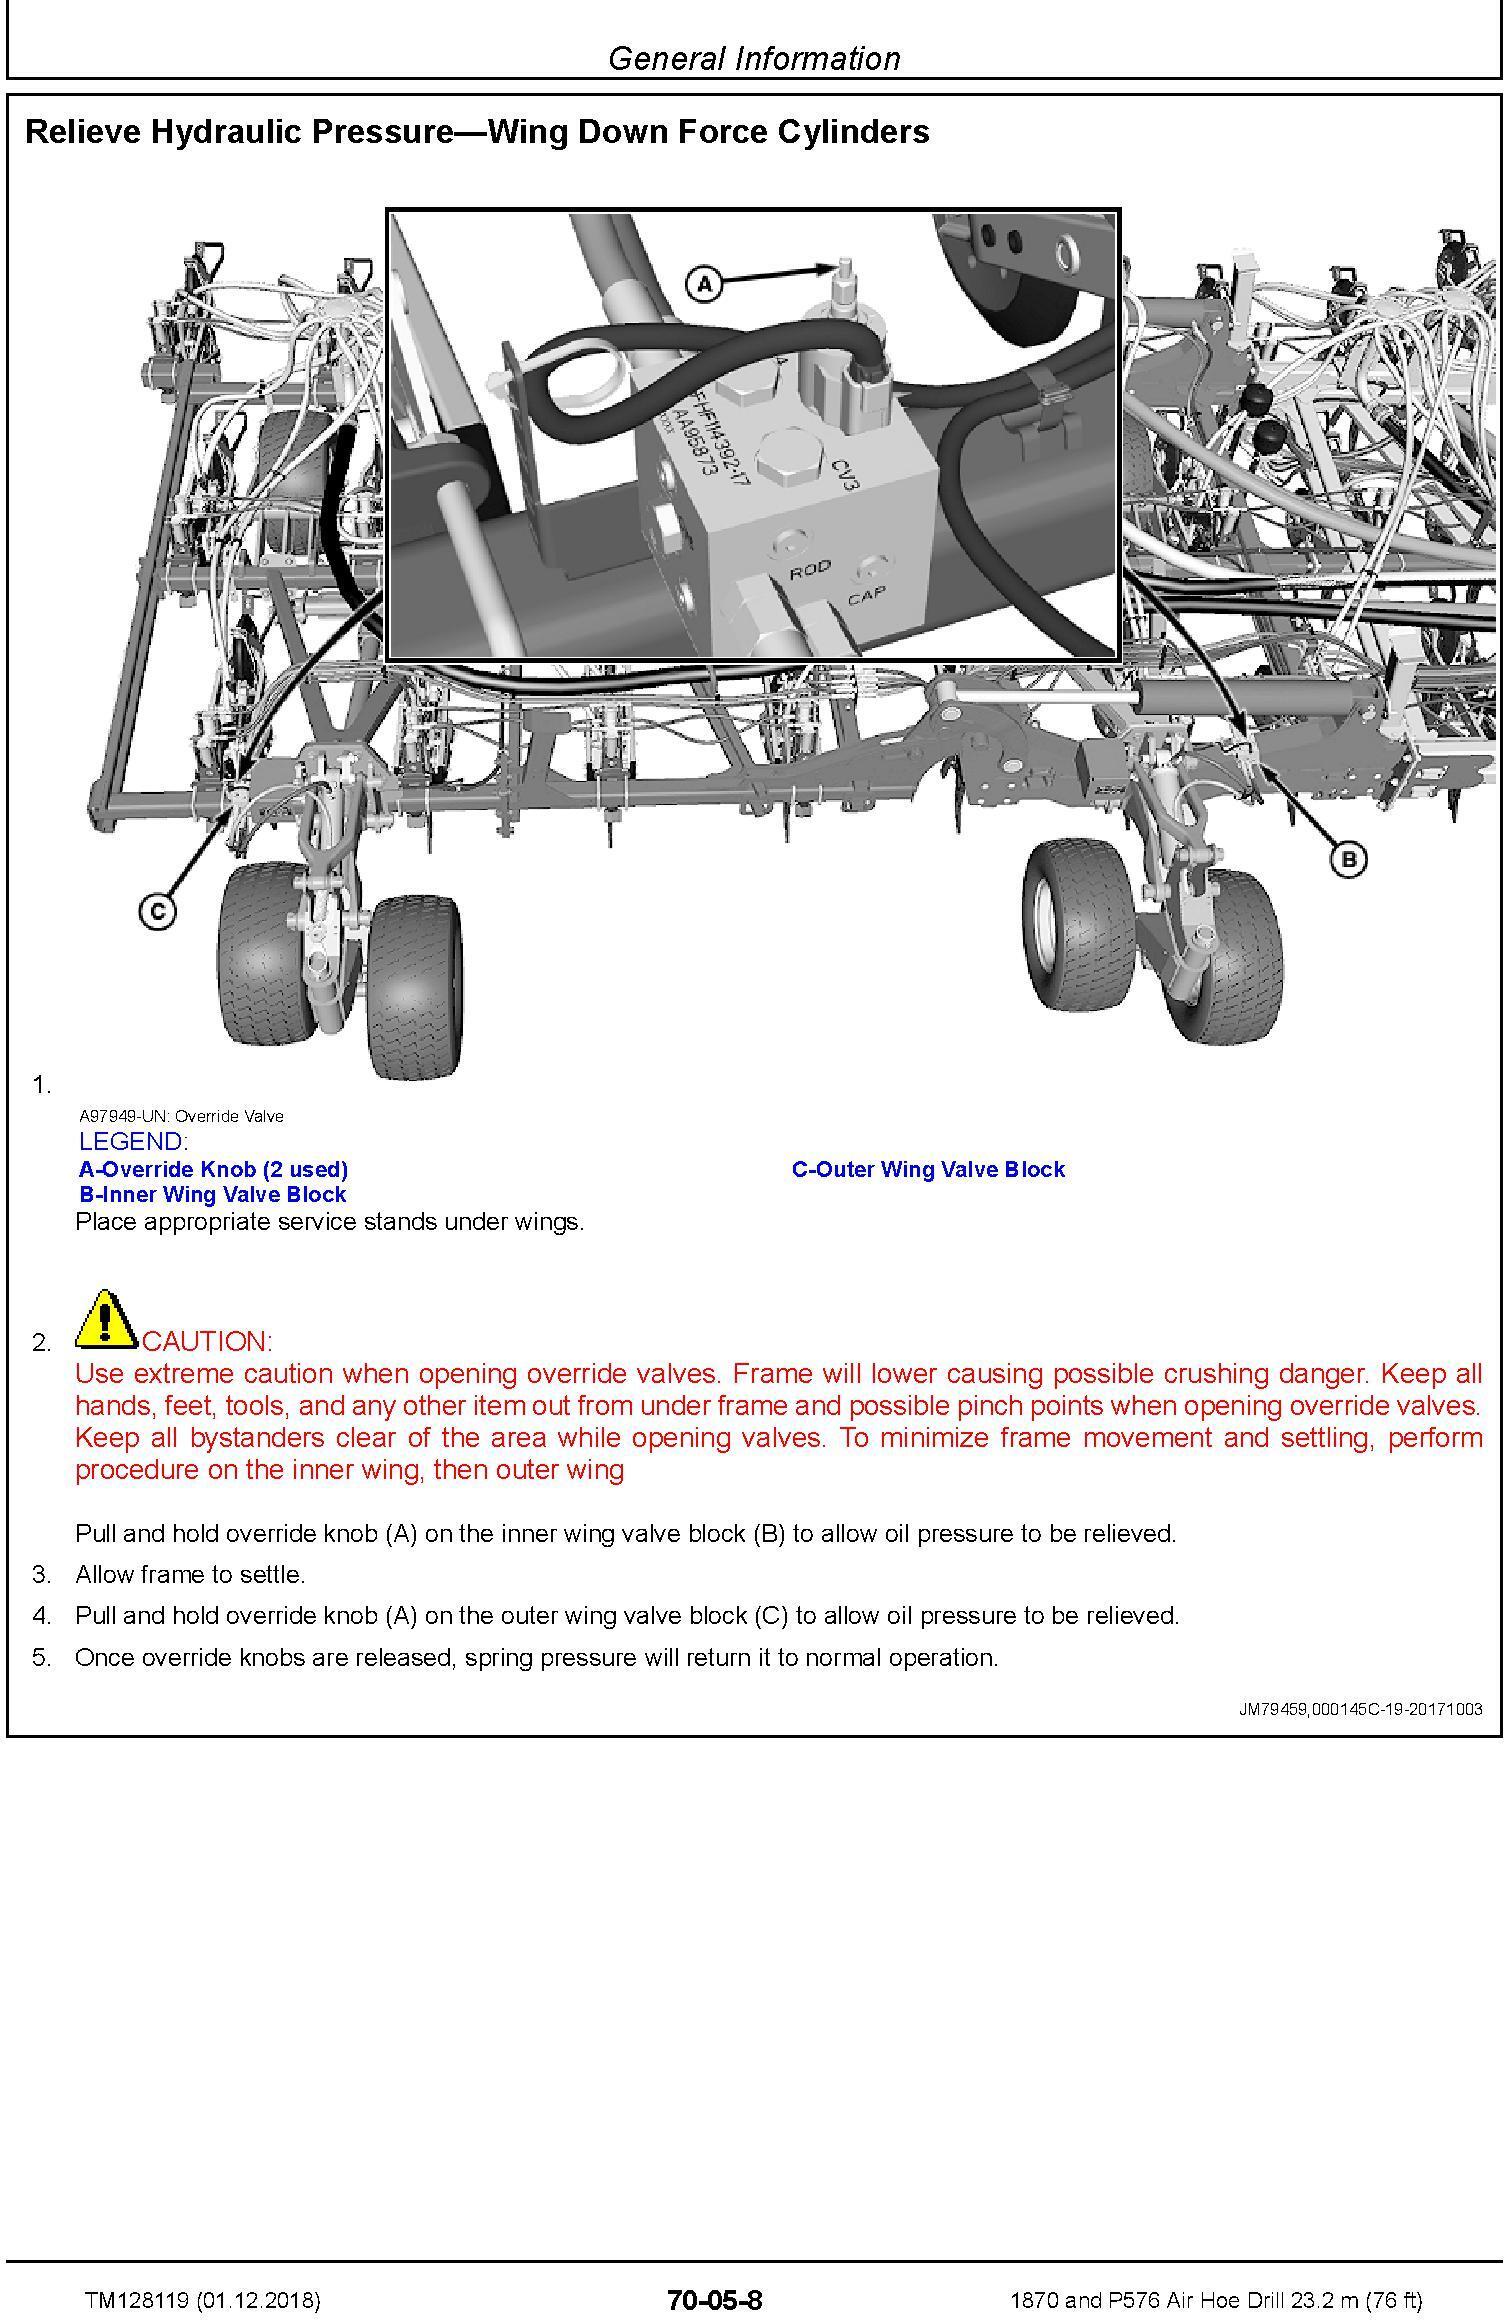 John Deere 1870 and P576 Air Hoe Drill 23.2 m (76 ft) Service Repair Technical Manual (TM128119) - 1